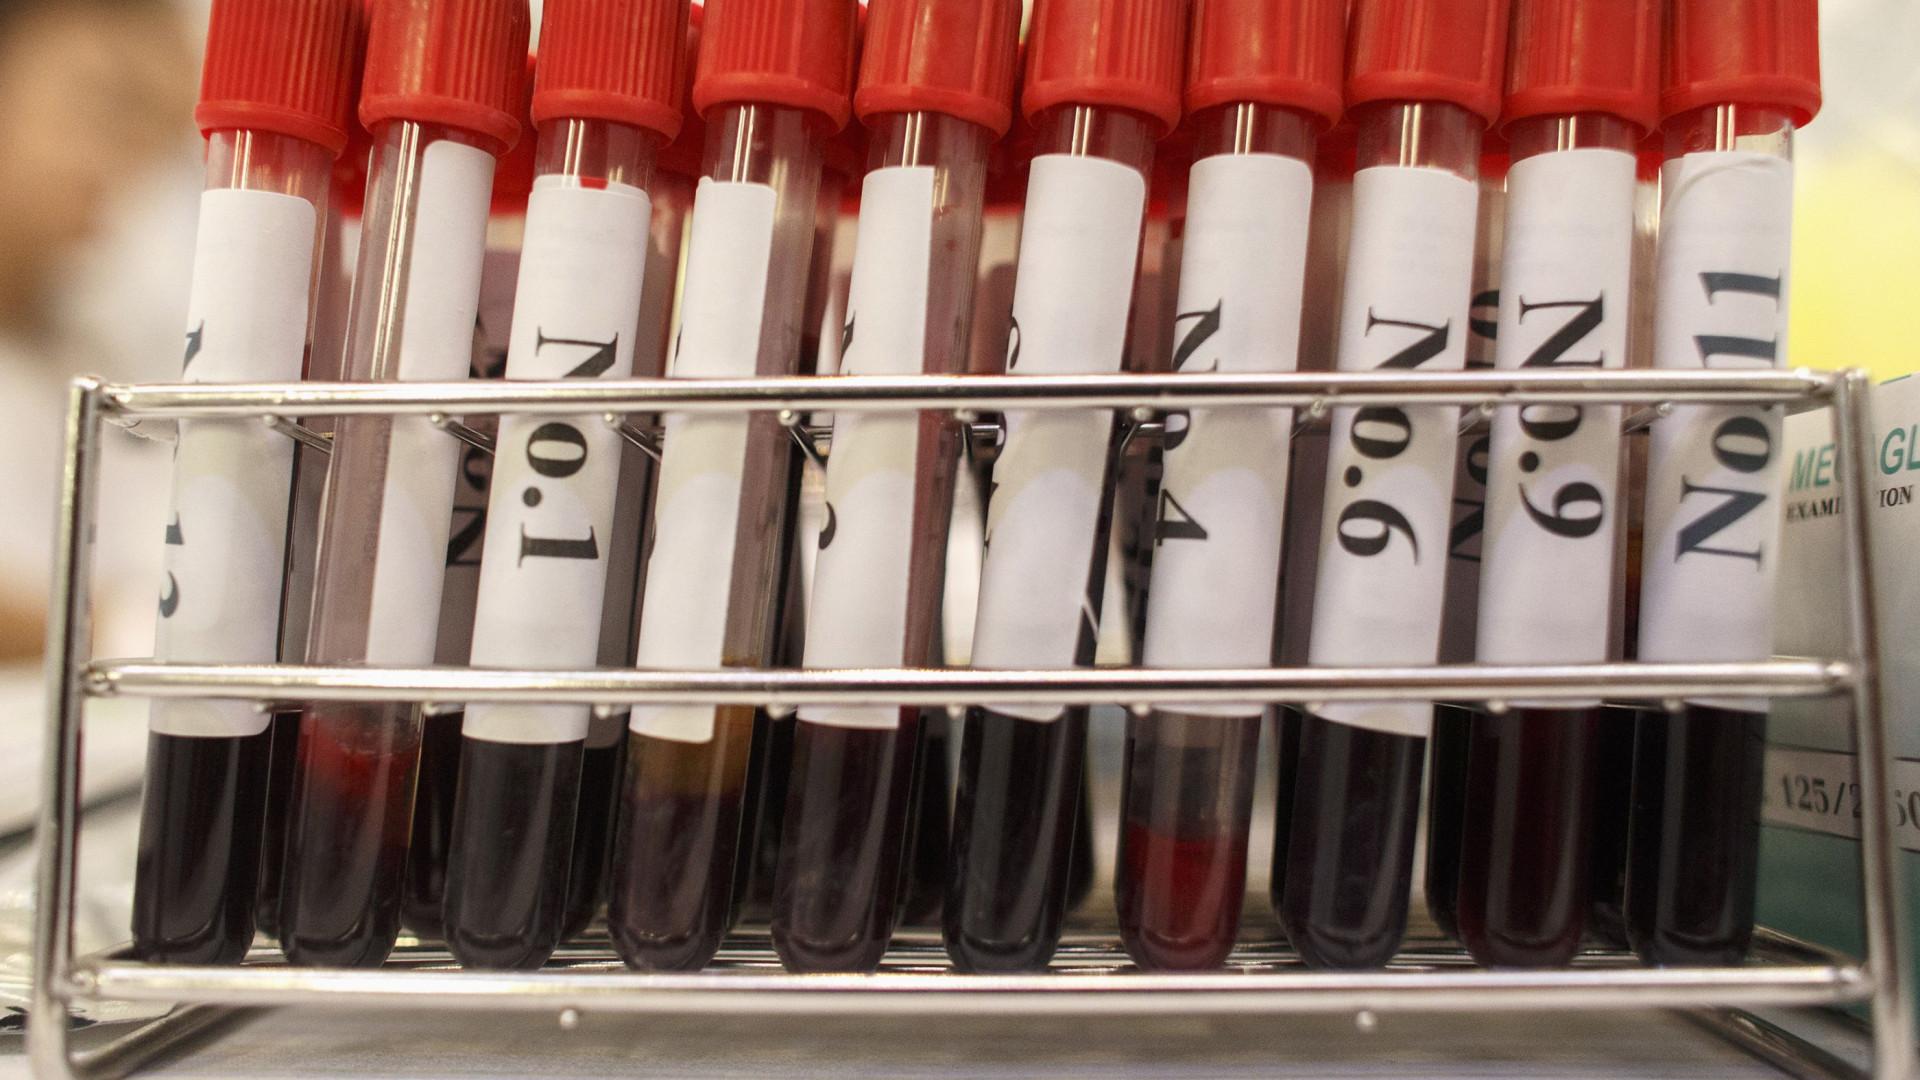 Legionella poderá ser transmitida pessoa-a-pessoa